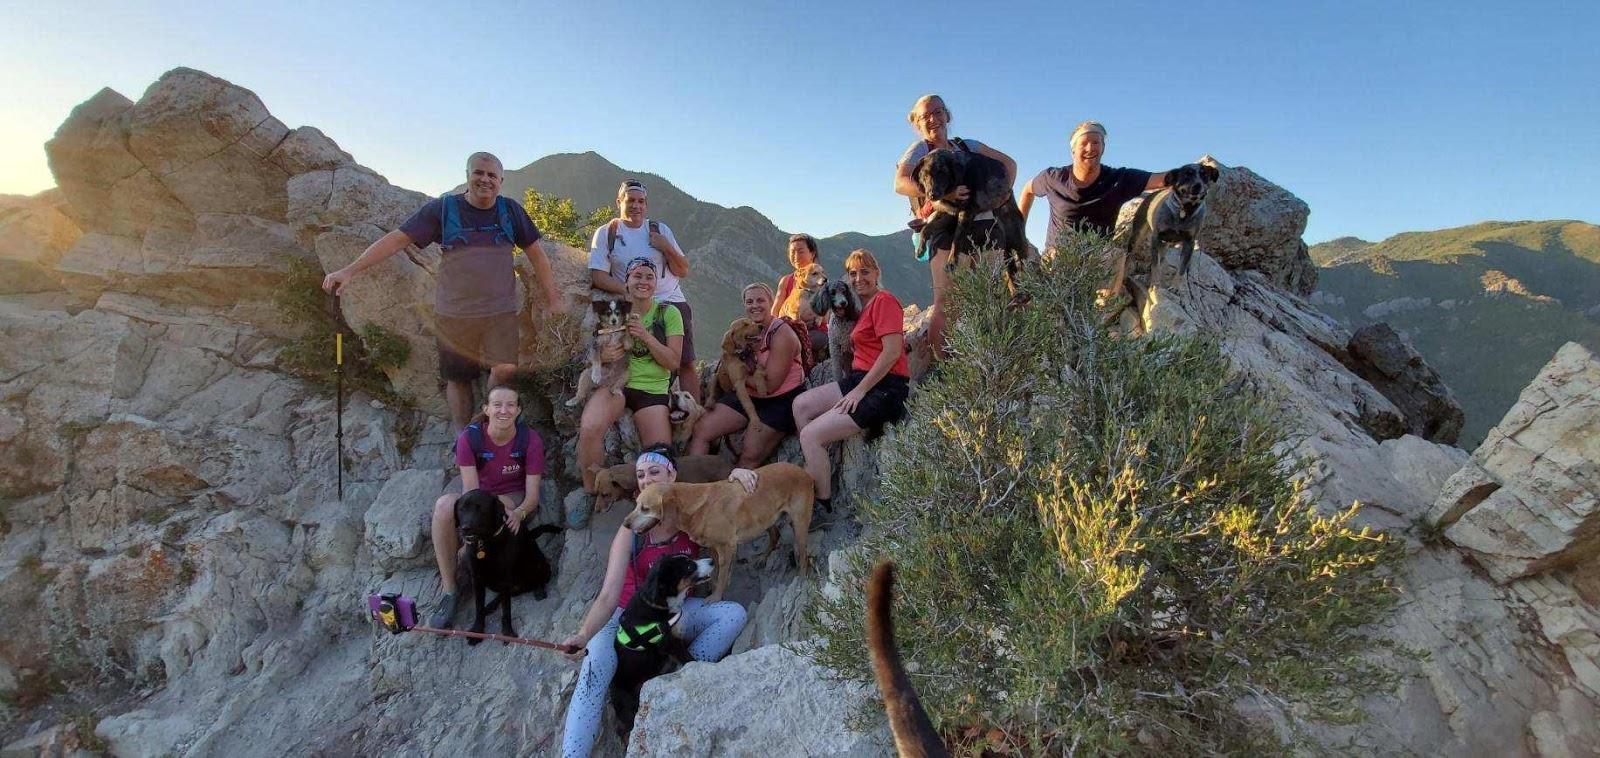 Hiking to Desolation Overlook, Millcreek Canyon, Utah, Hiking in Utah with Dogs, Salt Lake Overlook trail